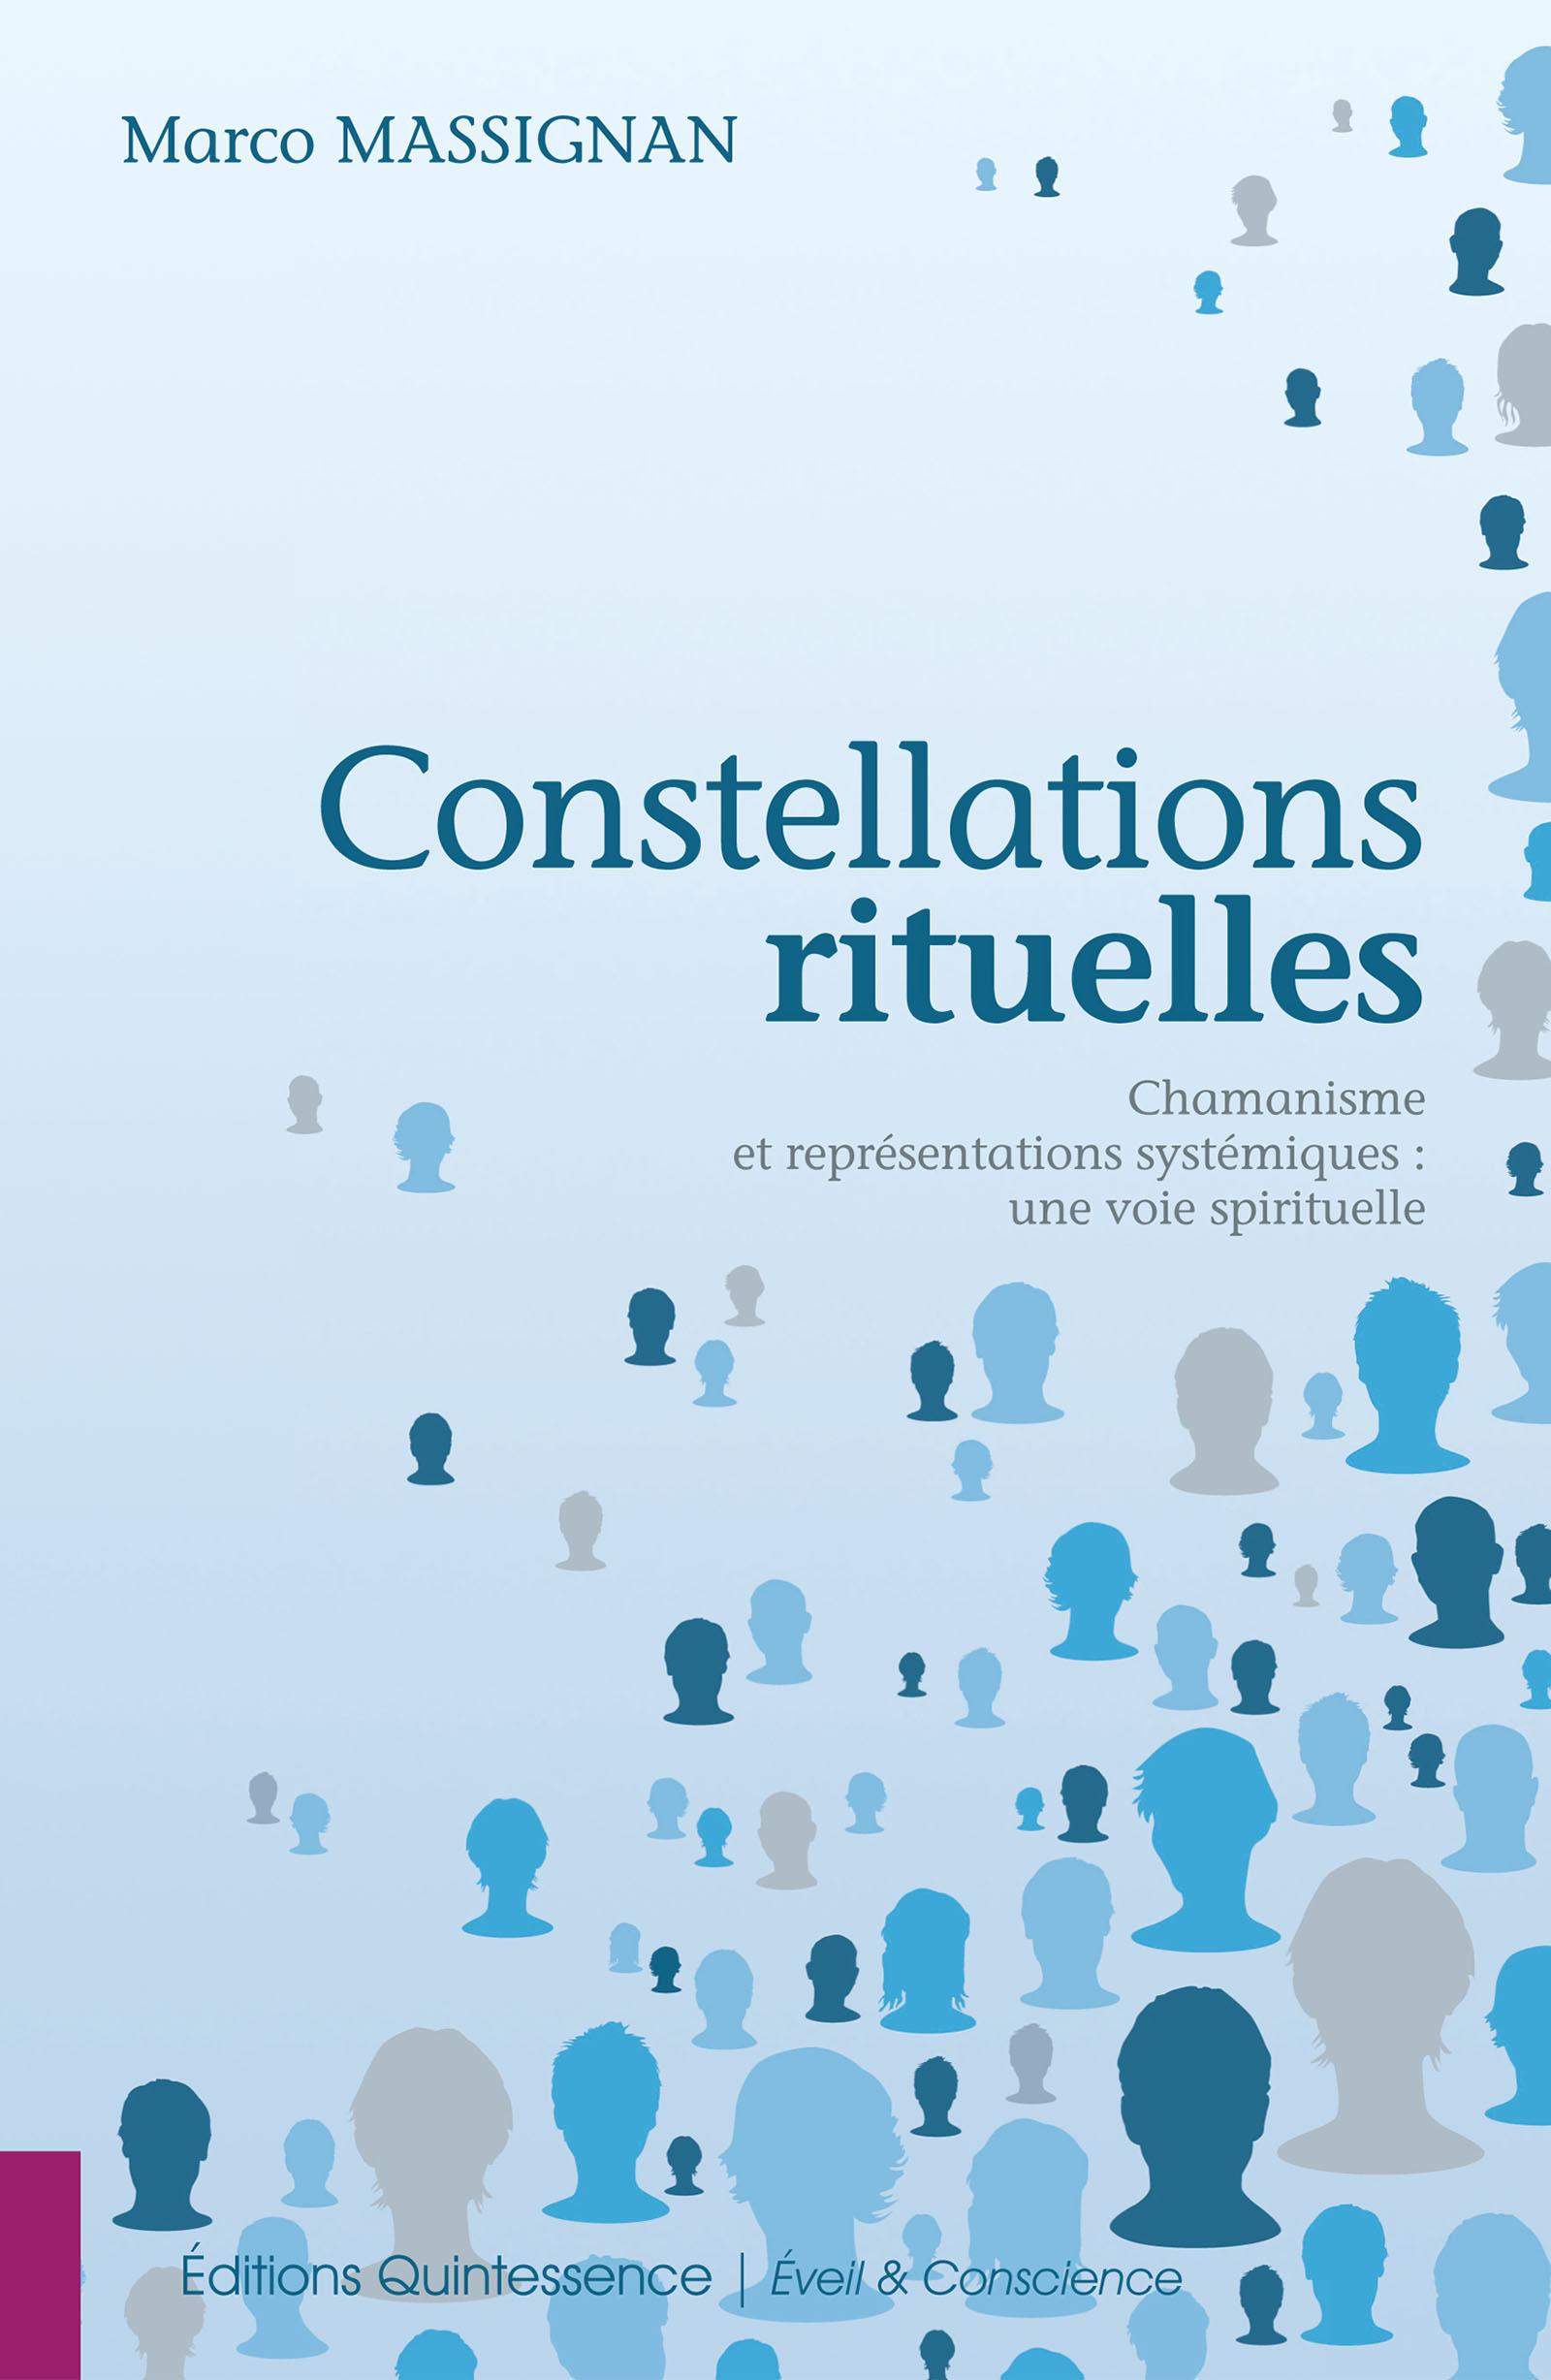 Constellations rituelles - chamanisme et representations systemiques